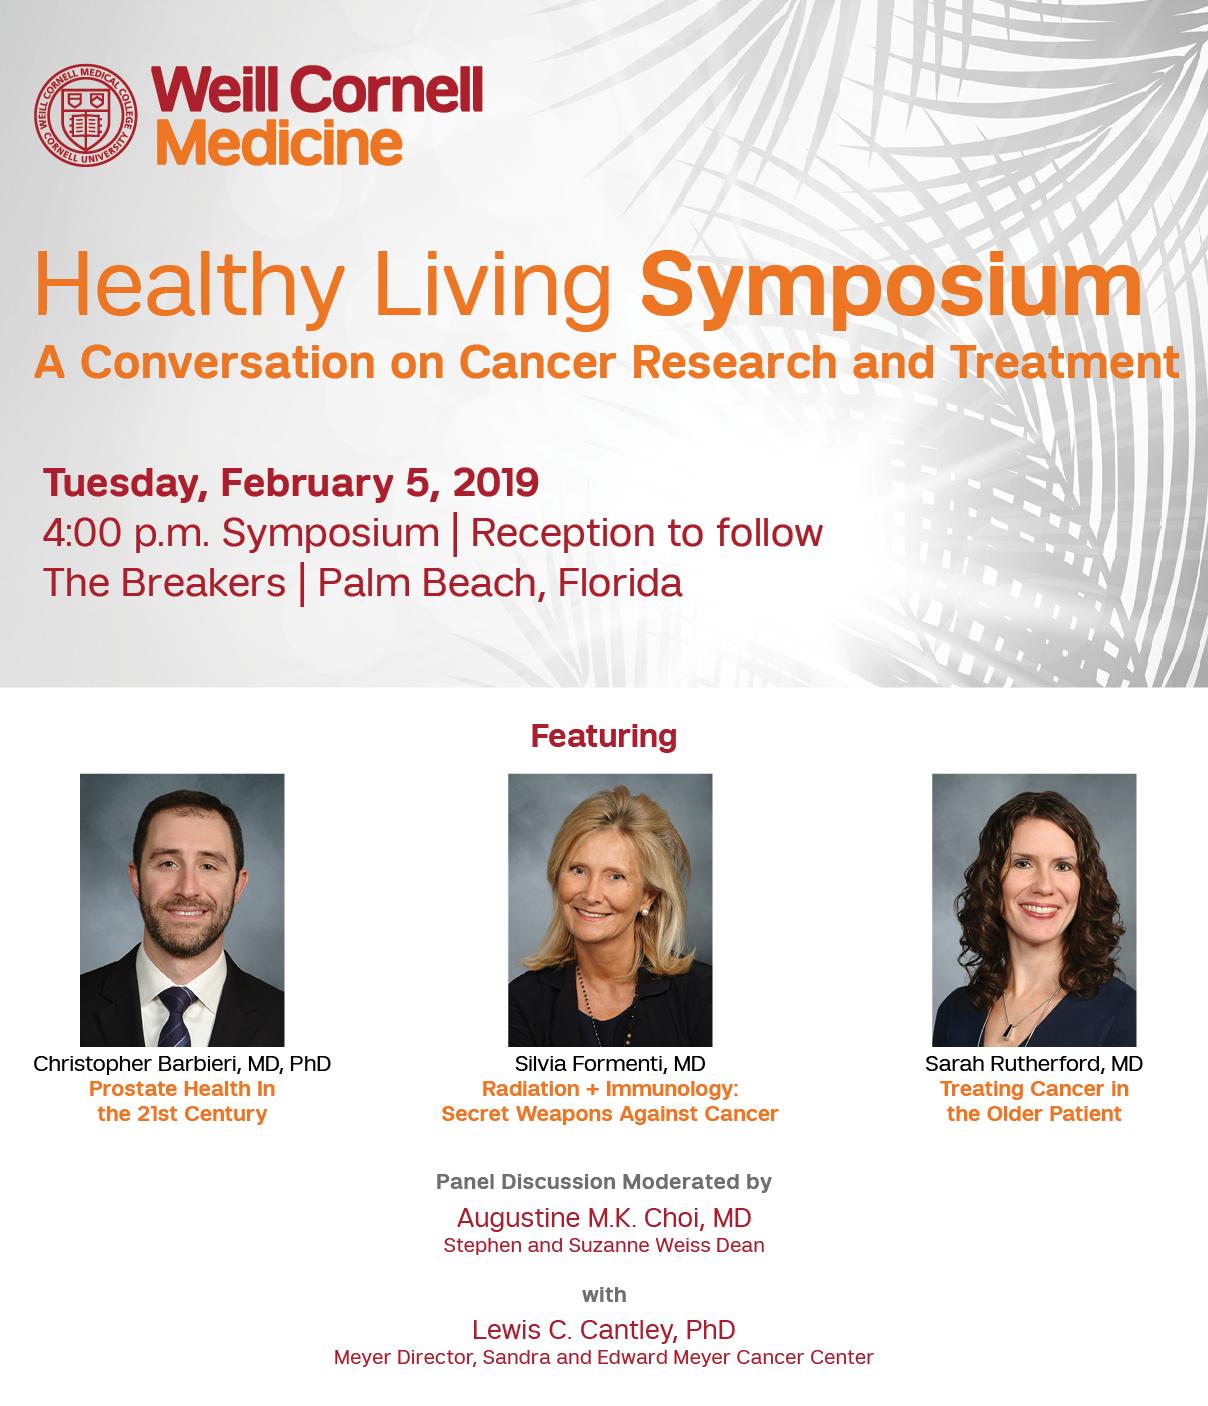 Healthy Living Symposium Details